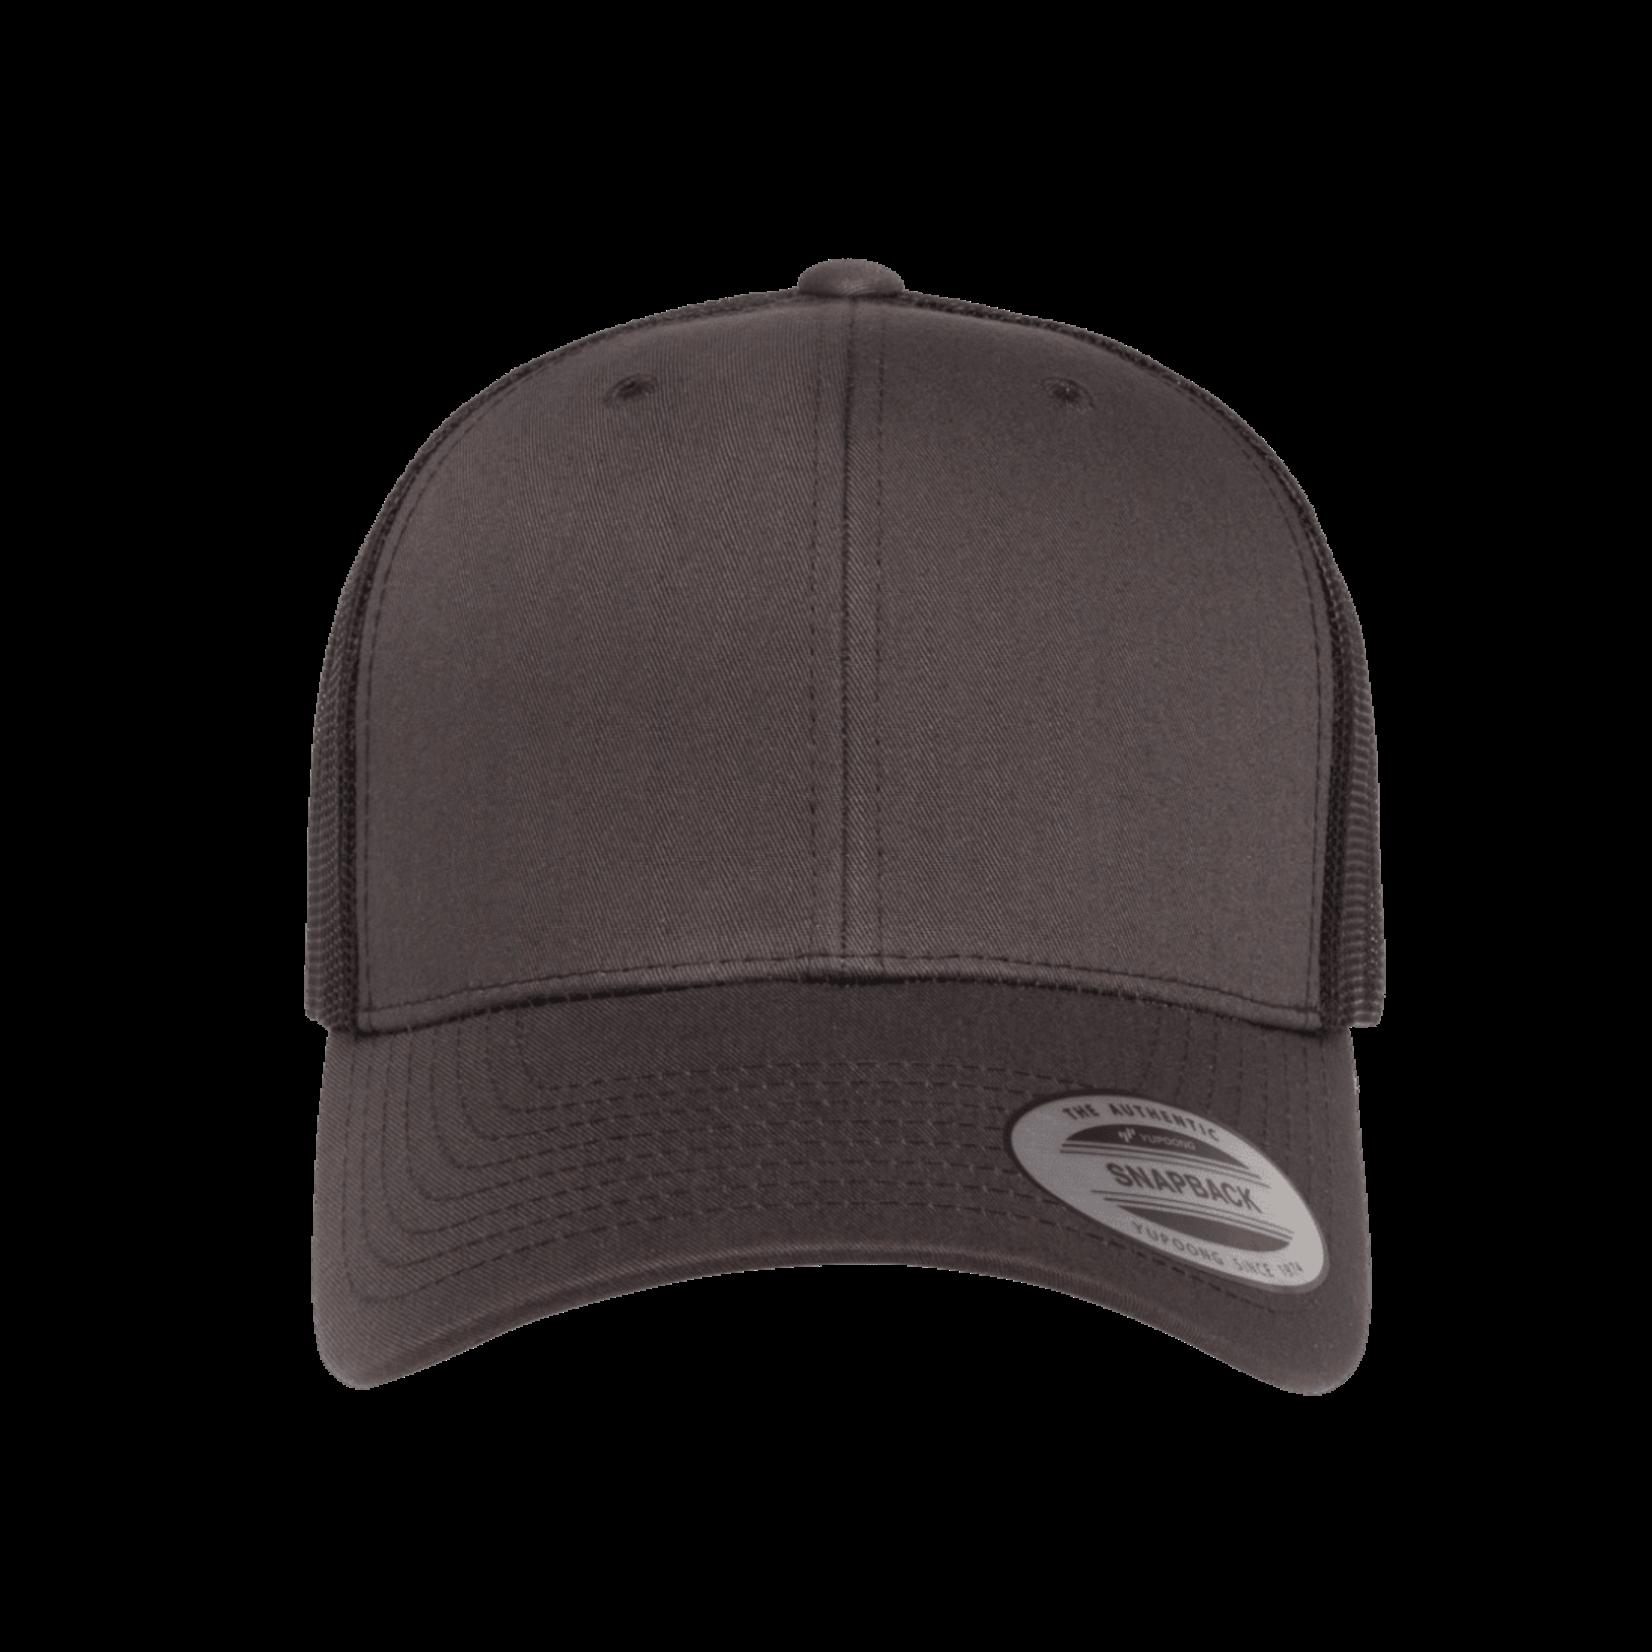 Flexfit Flexfit 6606T 2-Tone Snapback Trucker Hat - Charcoal/Black